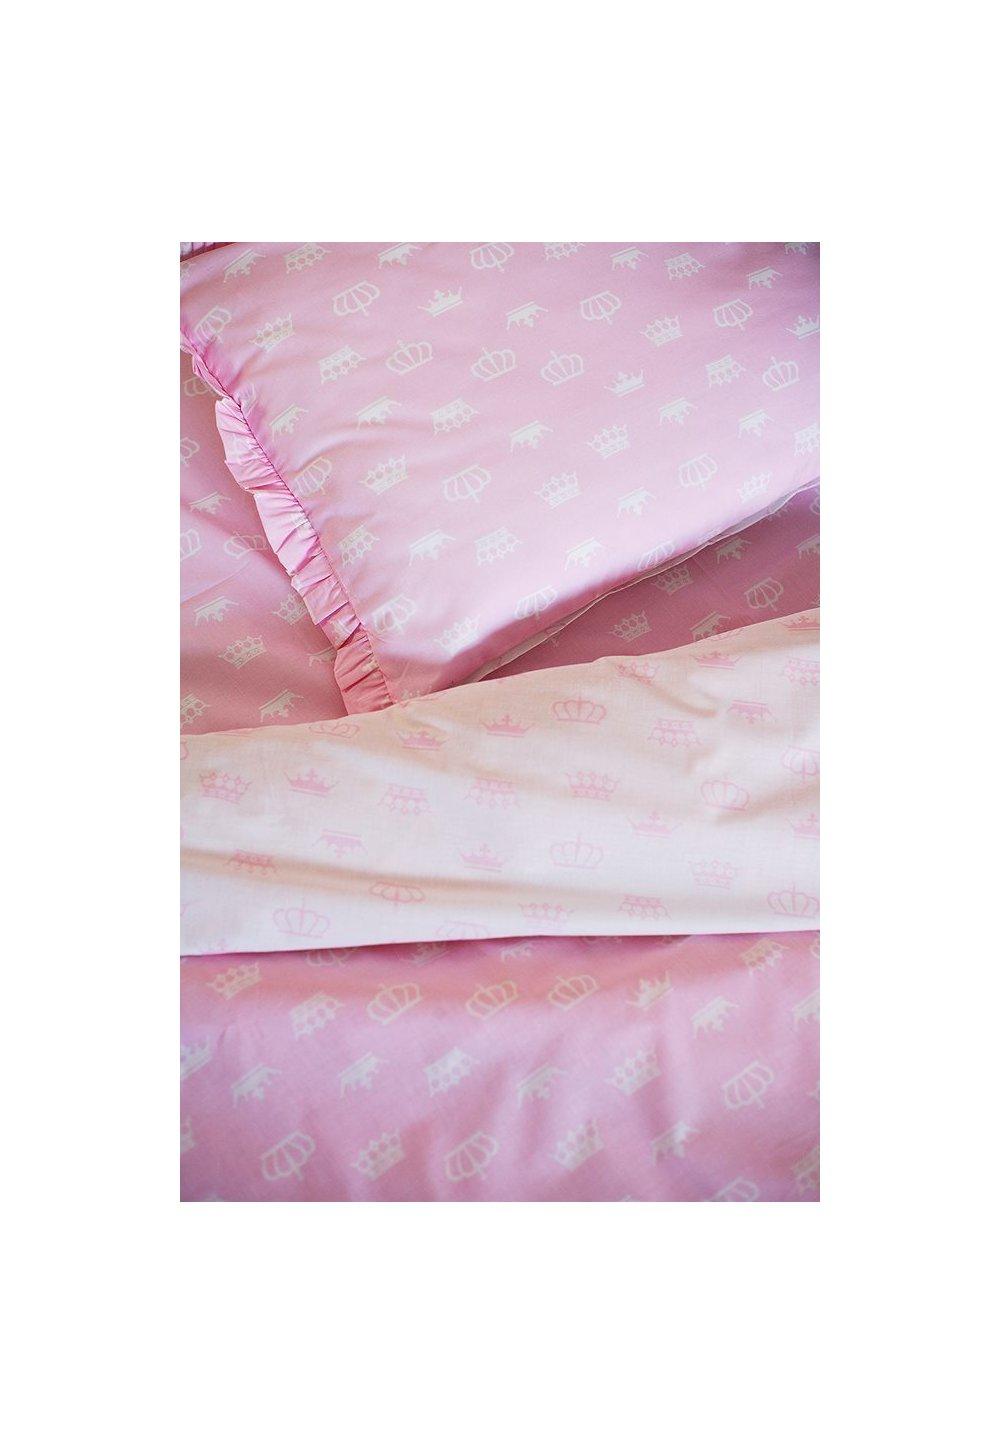 Lenjerie Princess 2 fete, alb cu roz, 160x200cm imagine